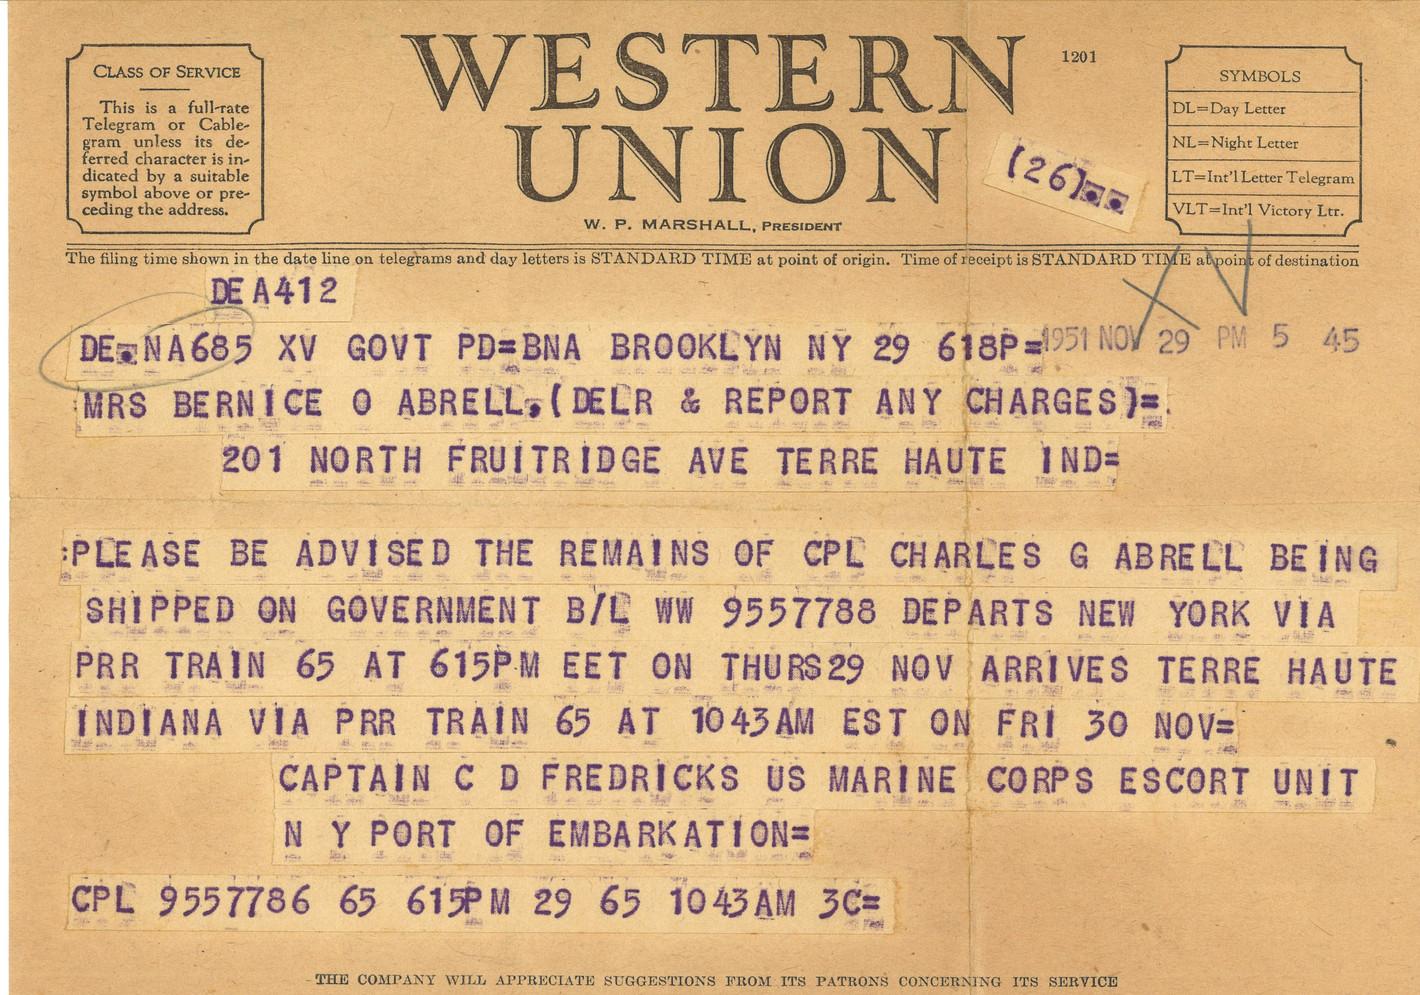 Telegram-Arrival of Remains